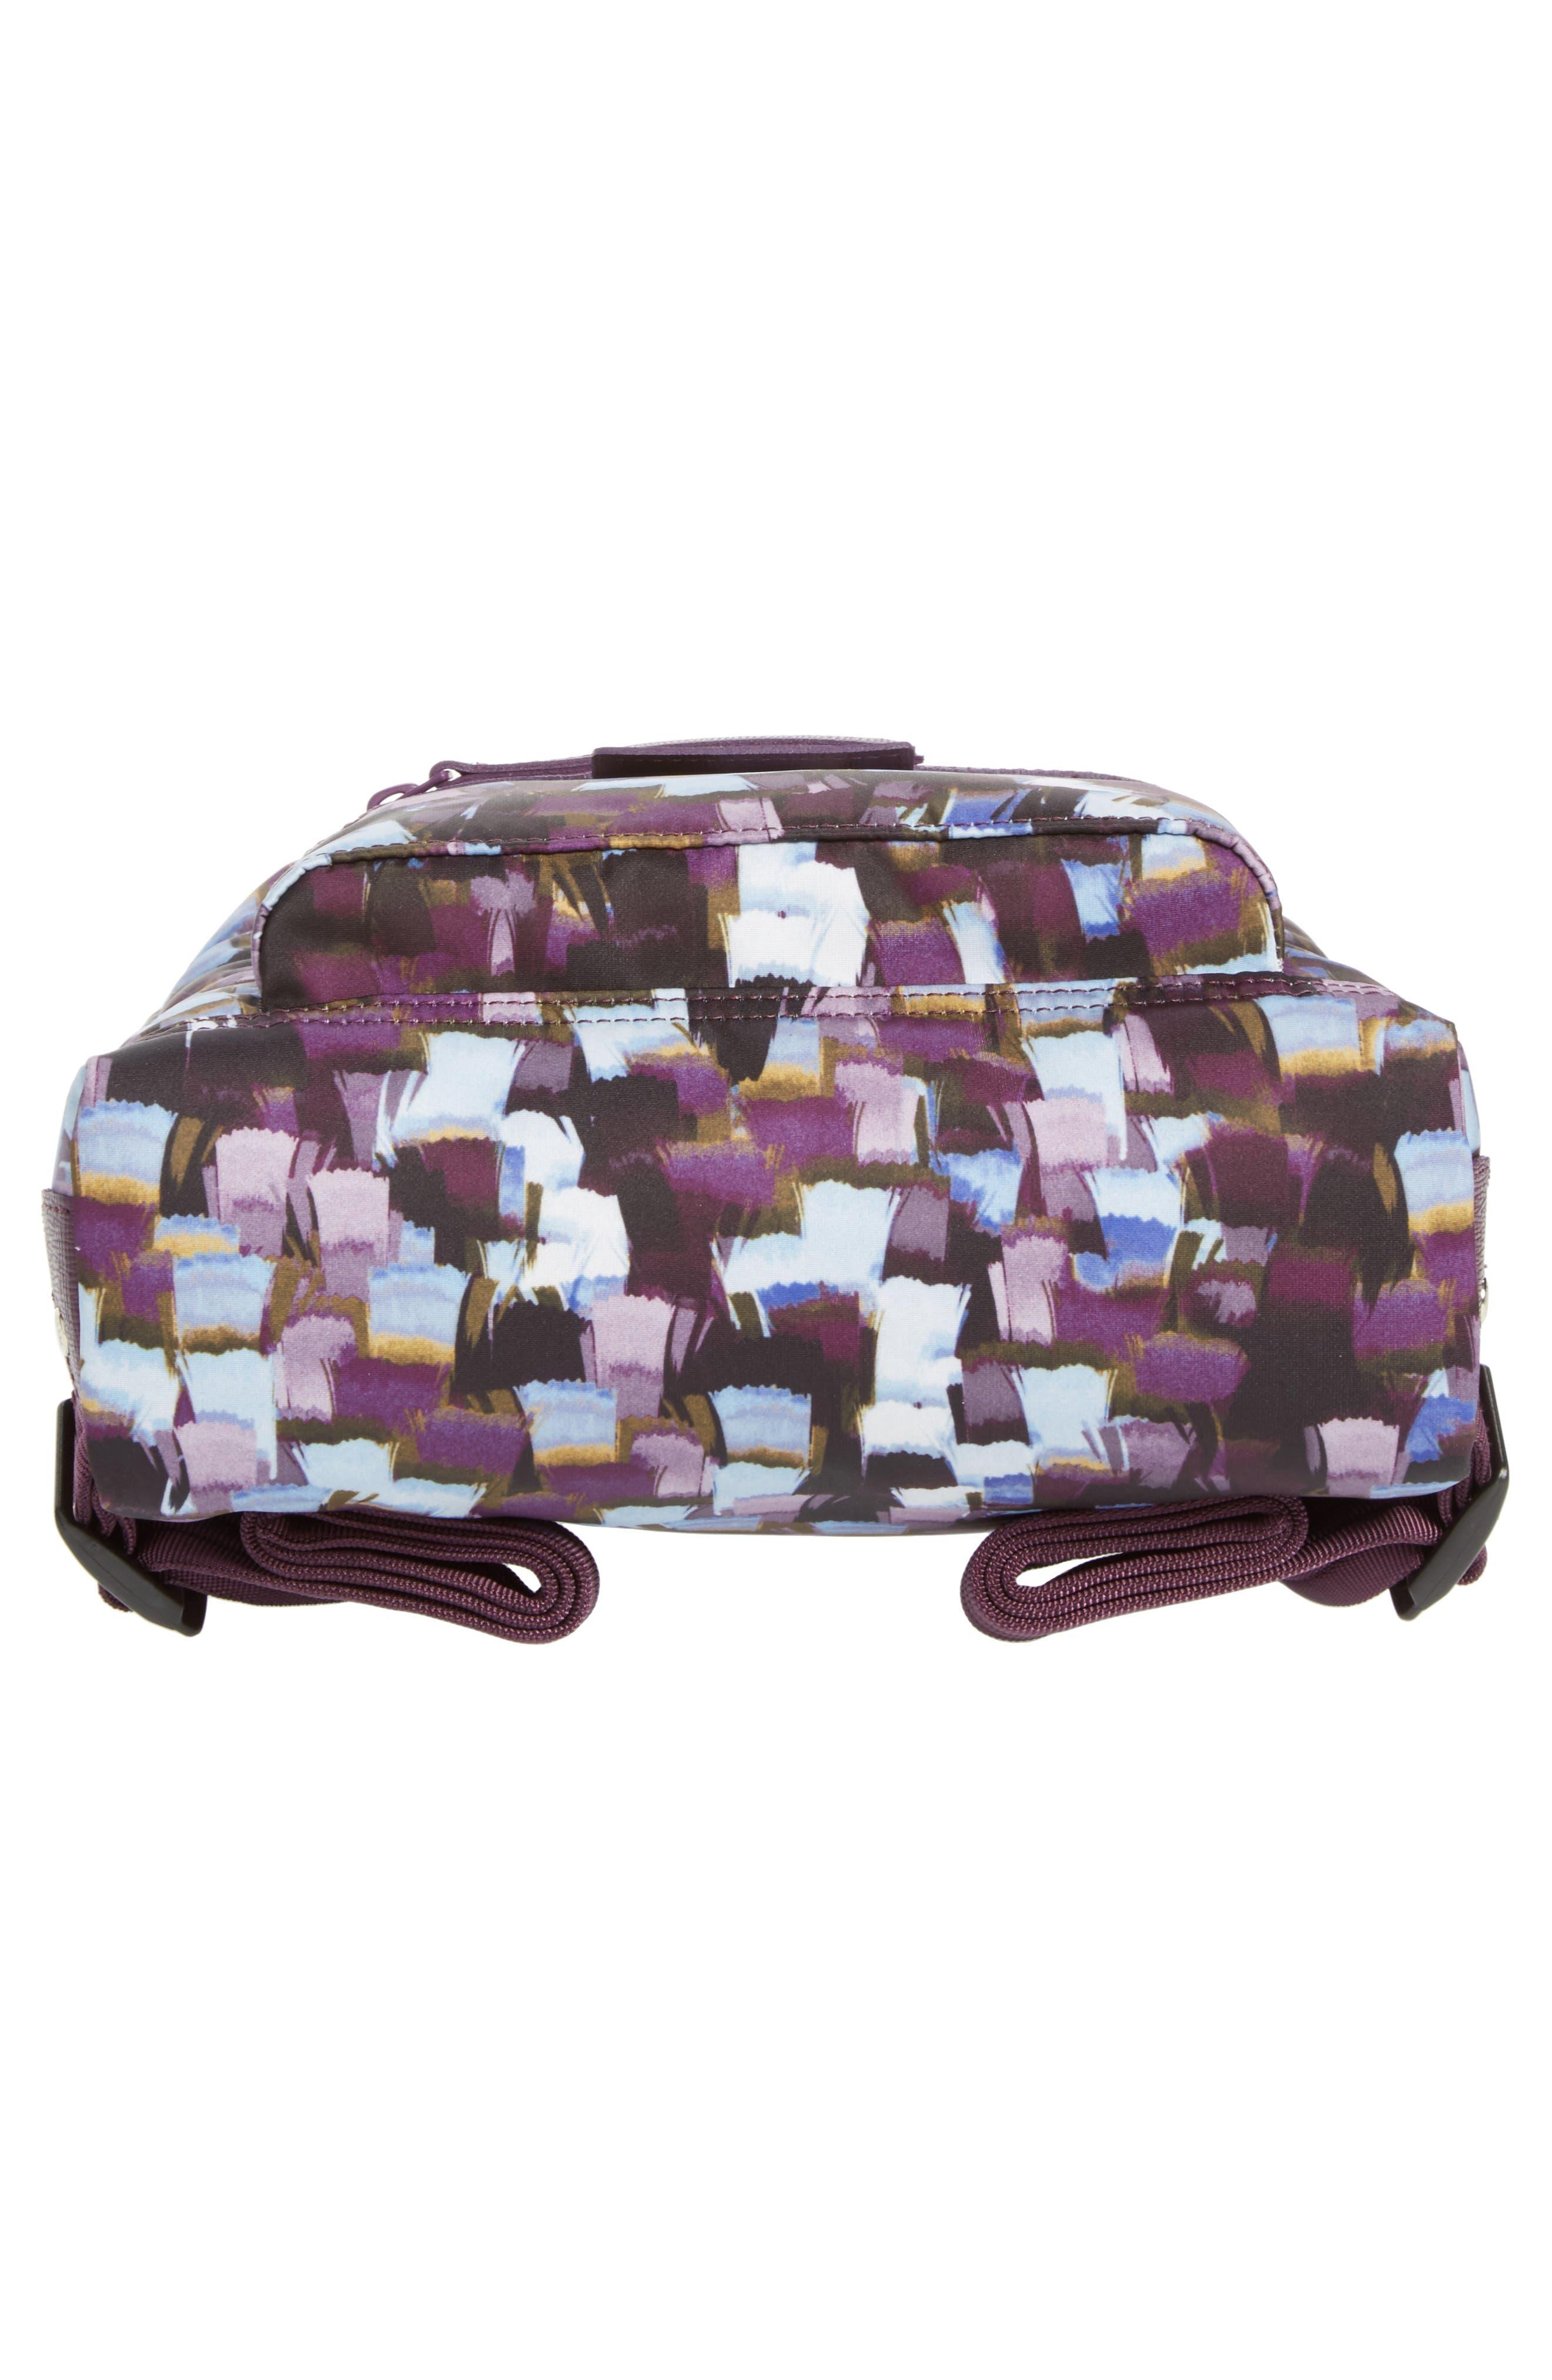 Le Pliage Neo - Vibrations Nylon Backpack,                             Alternate thumbnail 6, color,                             500